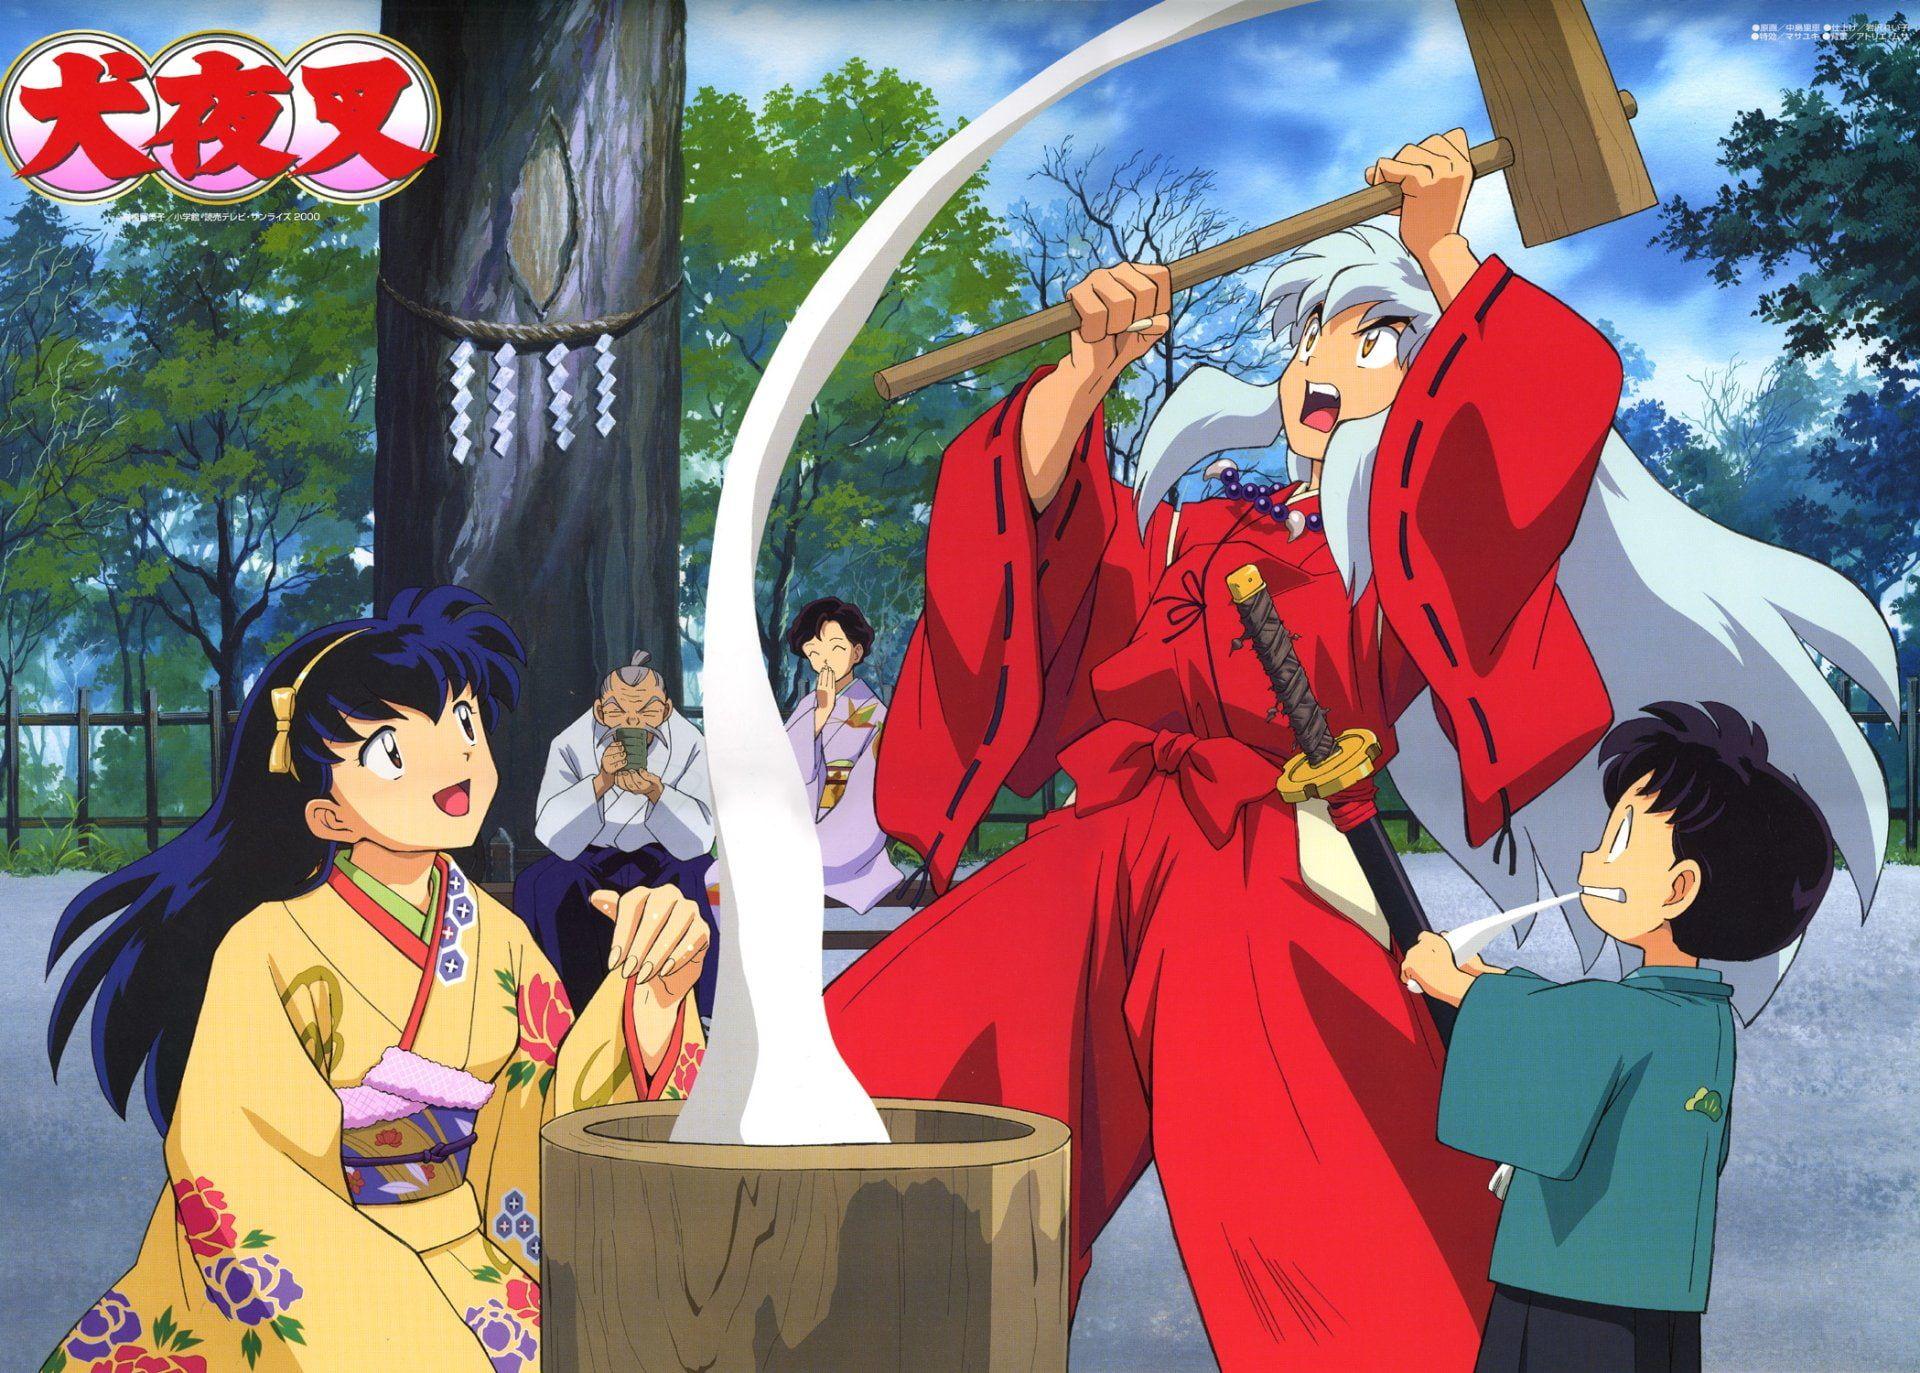 Anime Inuyasha Inuyasha Character 1080p Wallpaper Hdwallpaper Desktop In 2020 Inuyasha Anime Inuyasha Fan Art